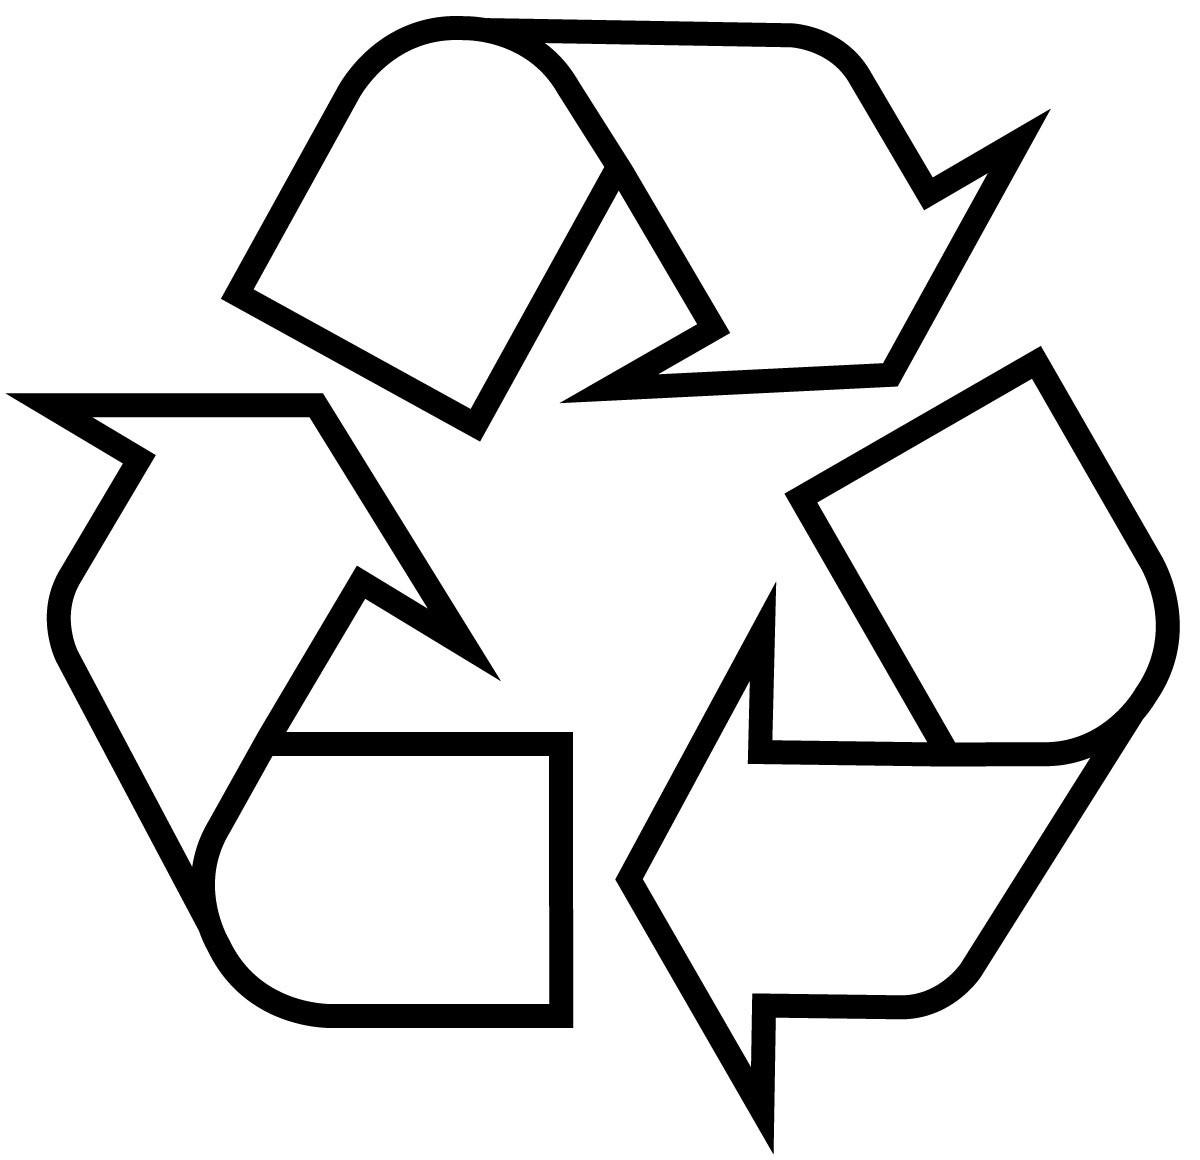 Gary anderson recycling symbol 1970 moma gary anderson recycling symbol 1970 biocorpaavc